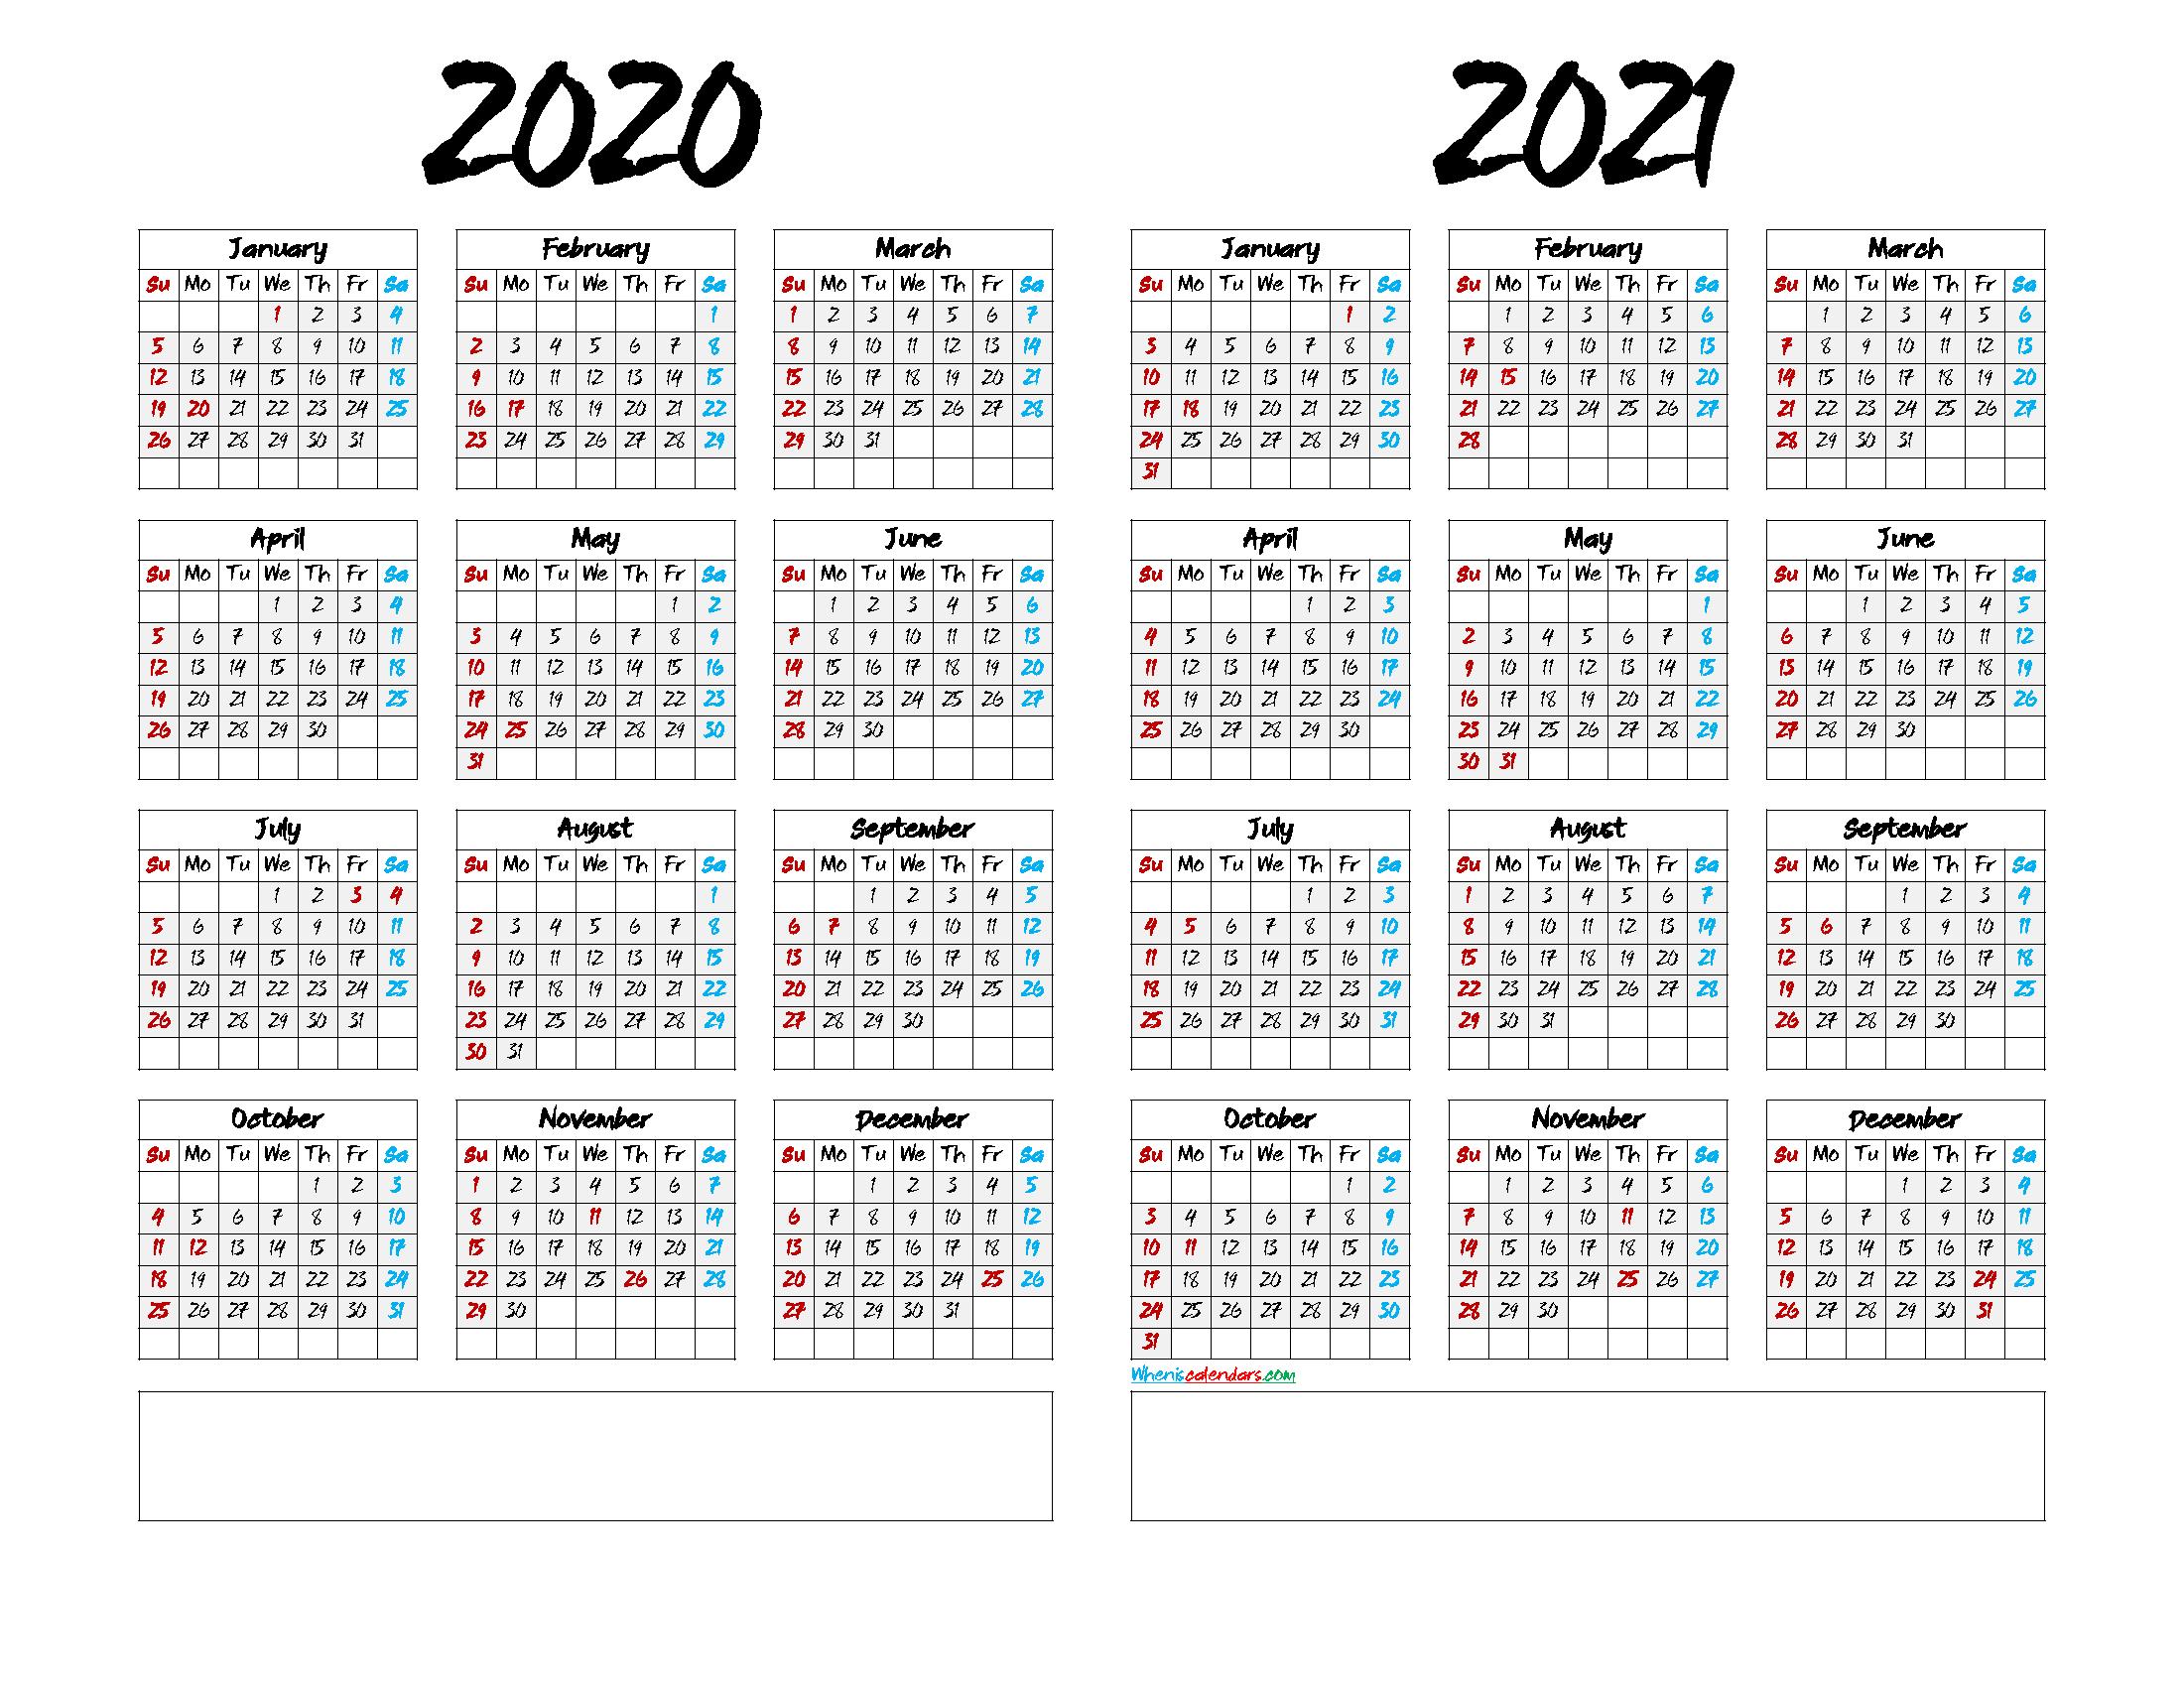 Printable 2020 and 2021 Calendar Landscape